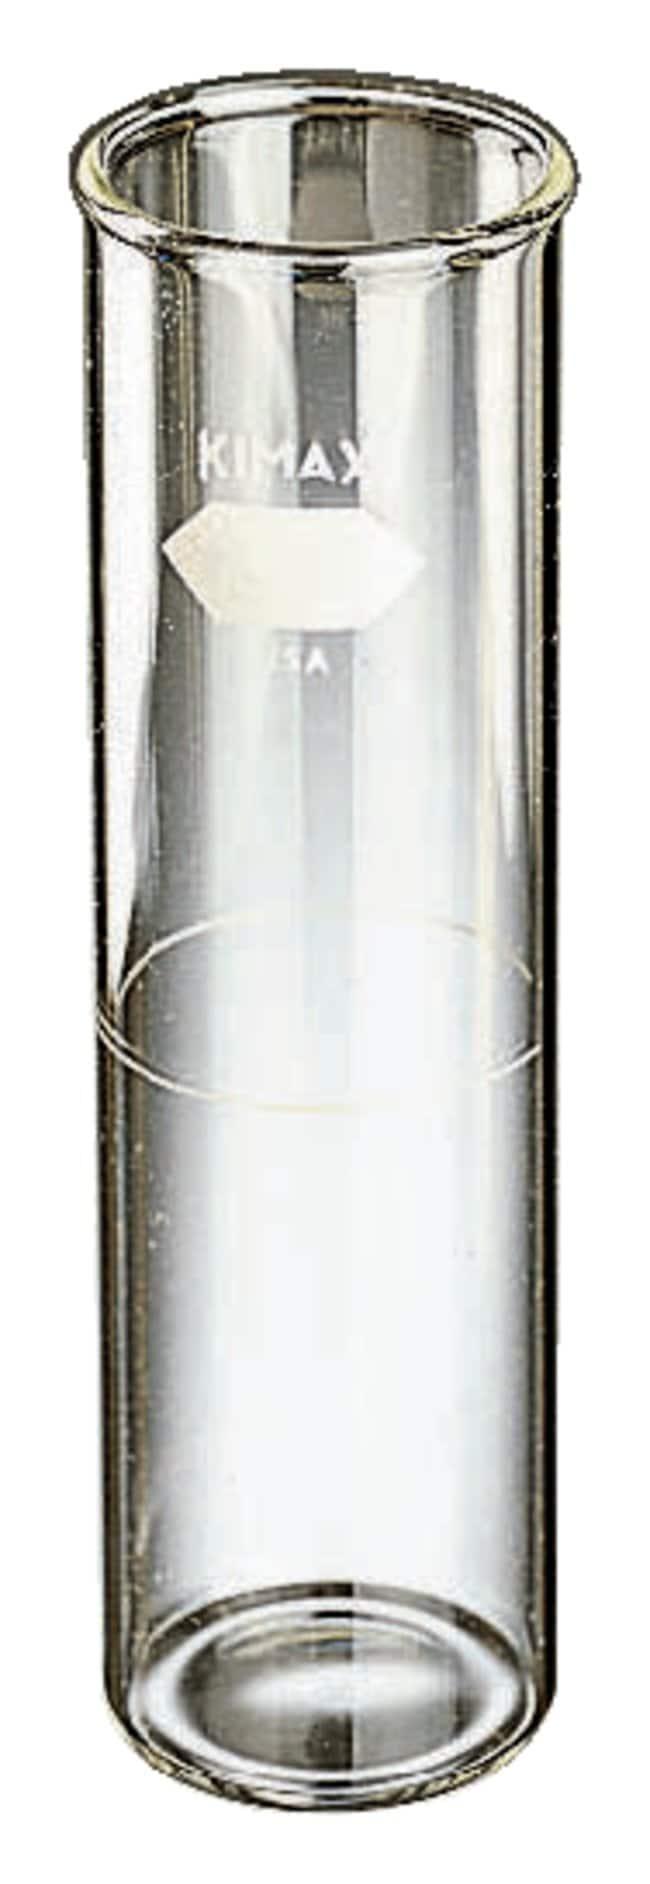 DWK Life SciencesJAR,COLD TEST,35X125MM VE=36 35x125mm (ADxH) Petroleumflaschen